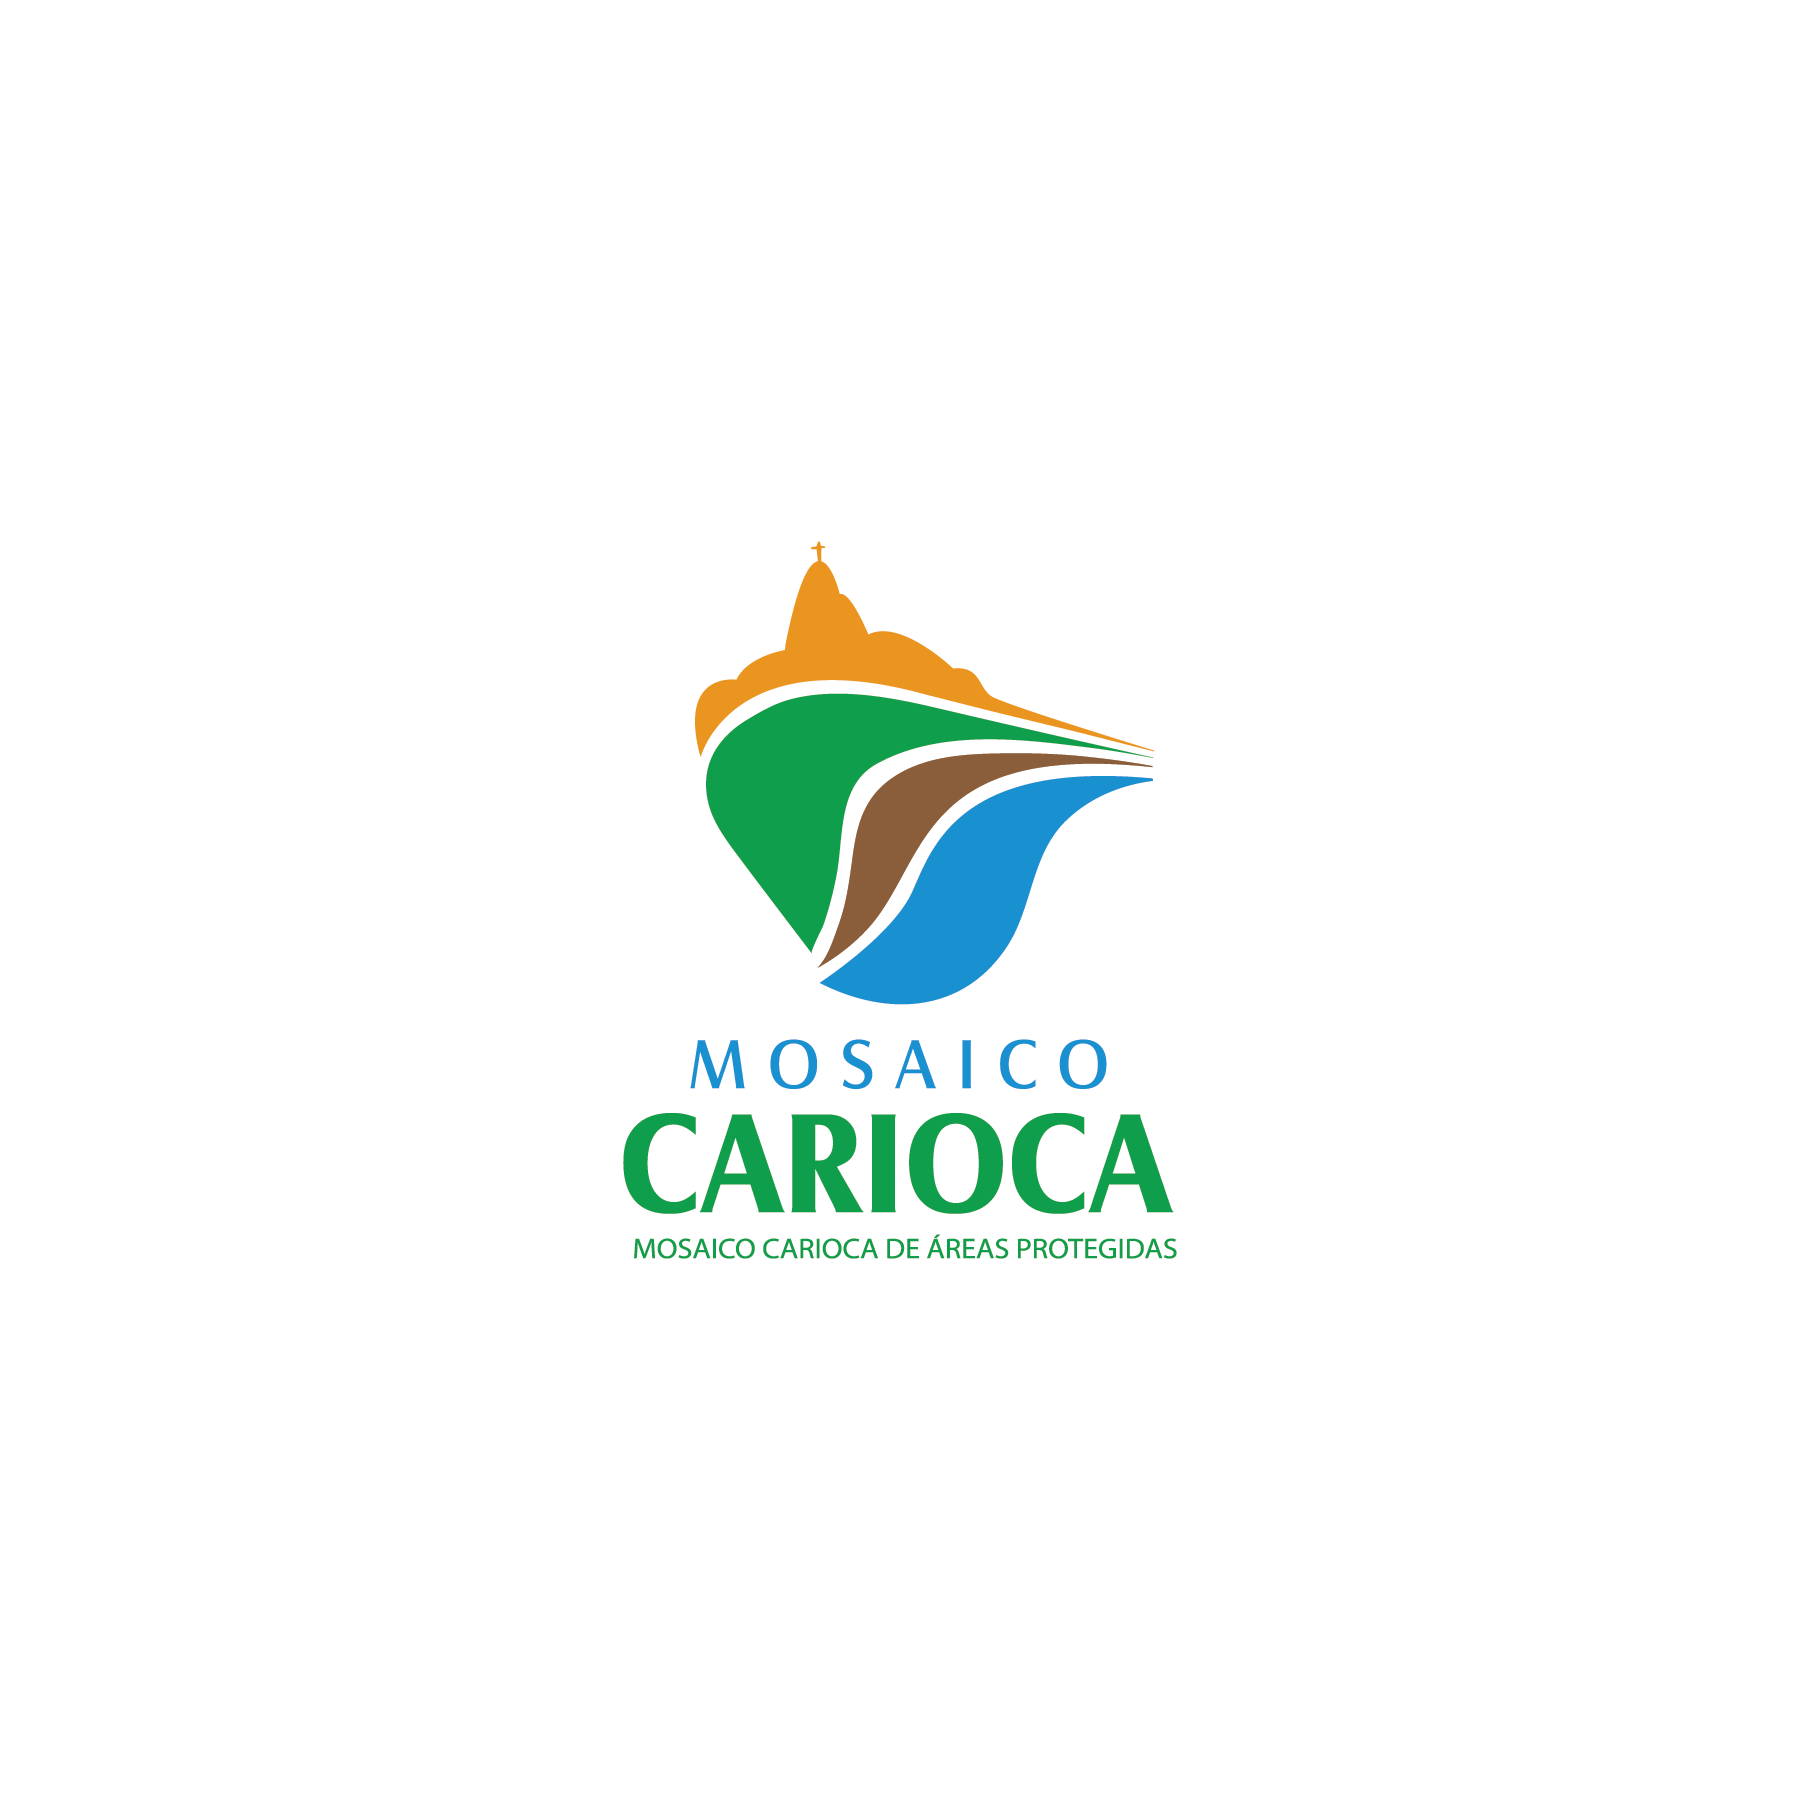 MOSAICO CARIOCA